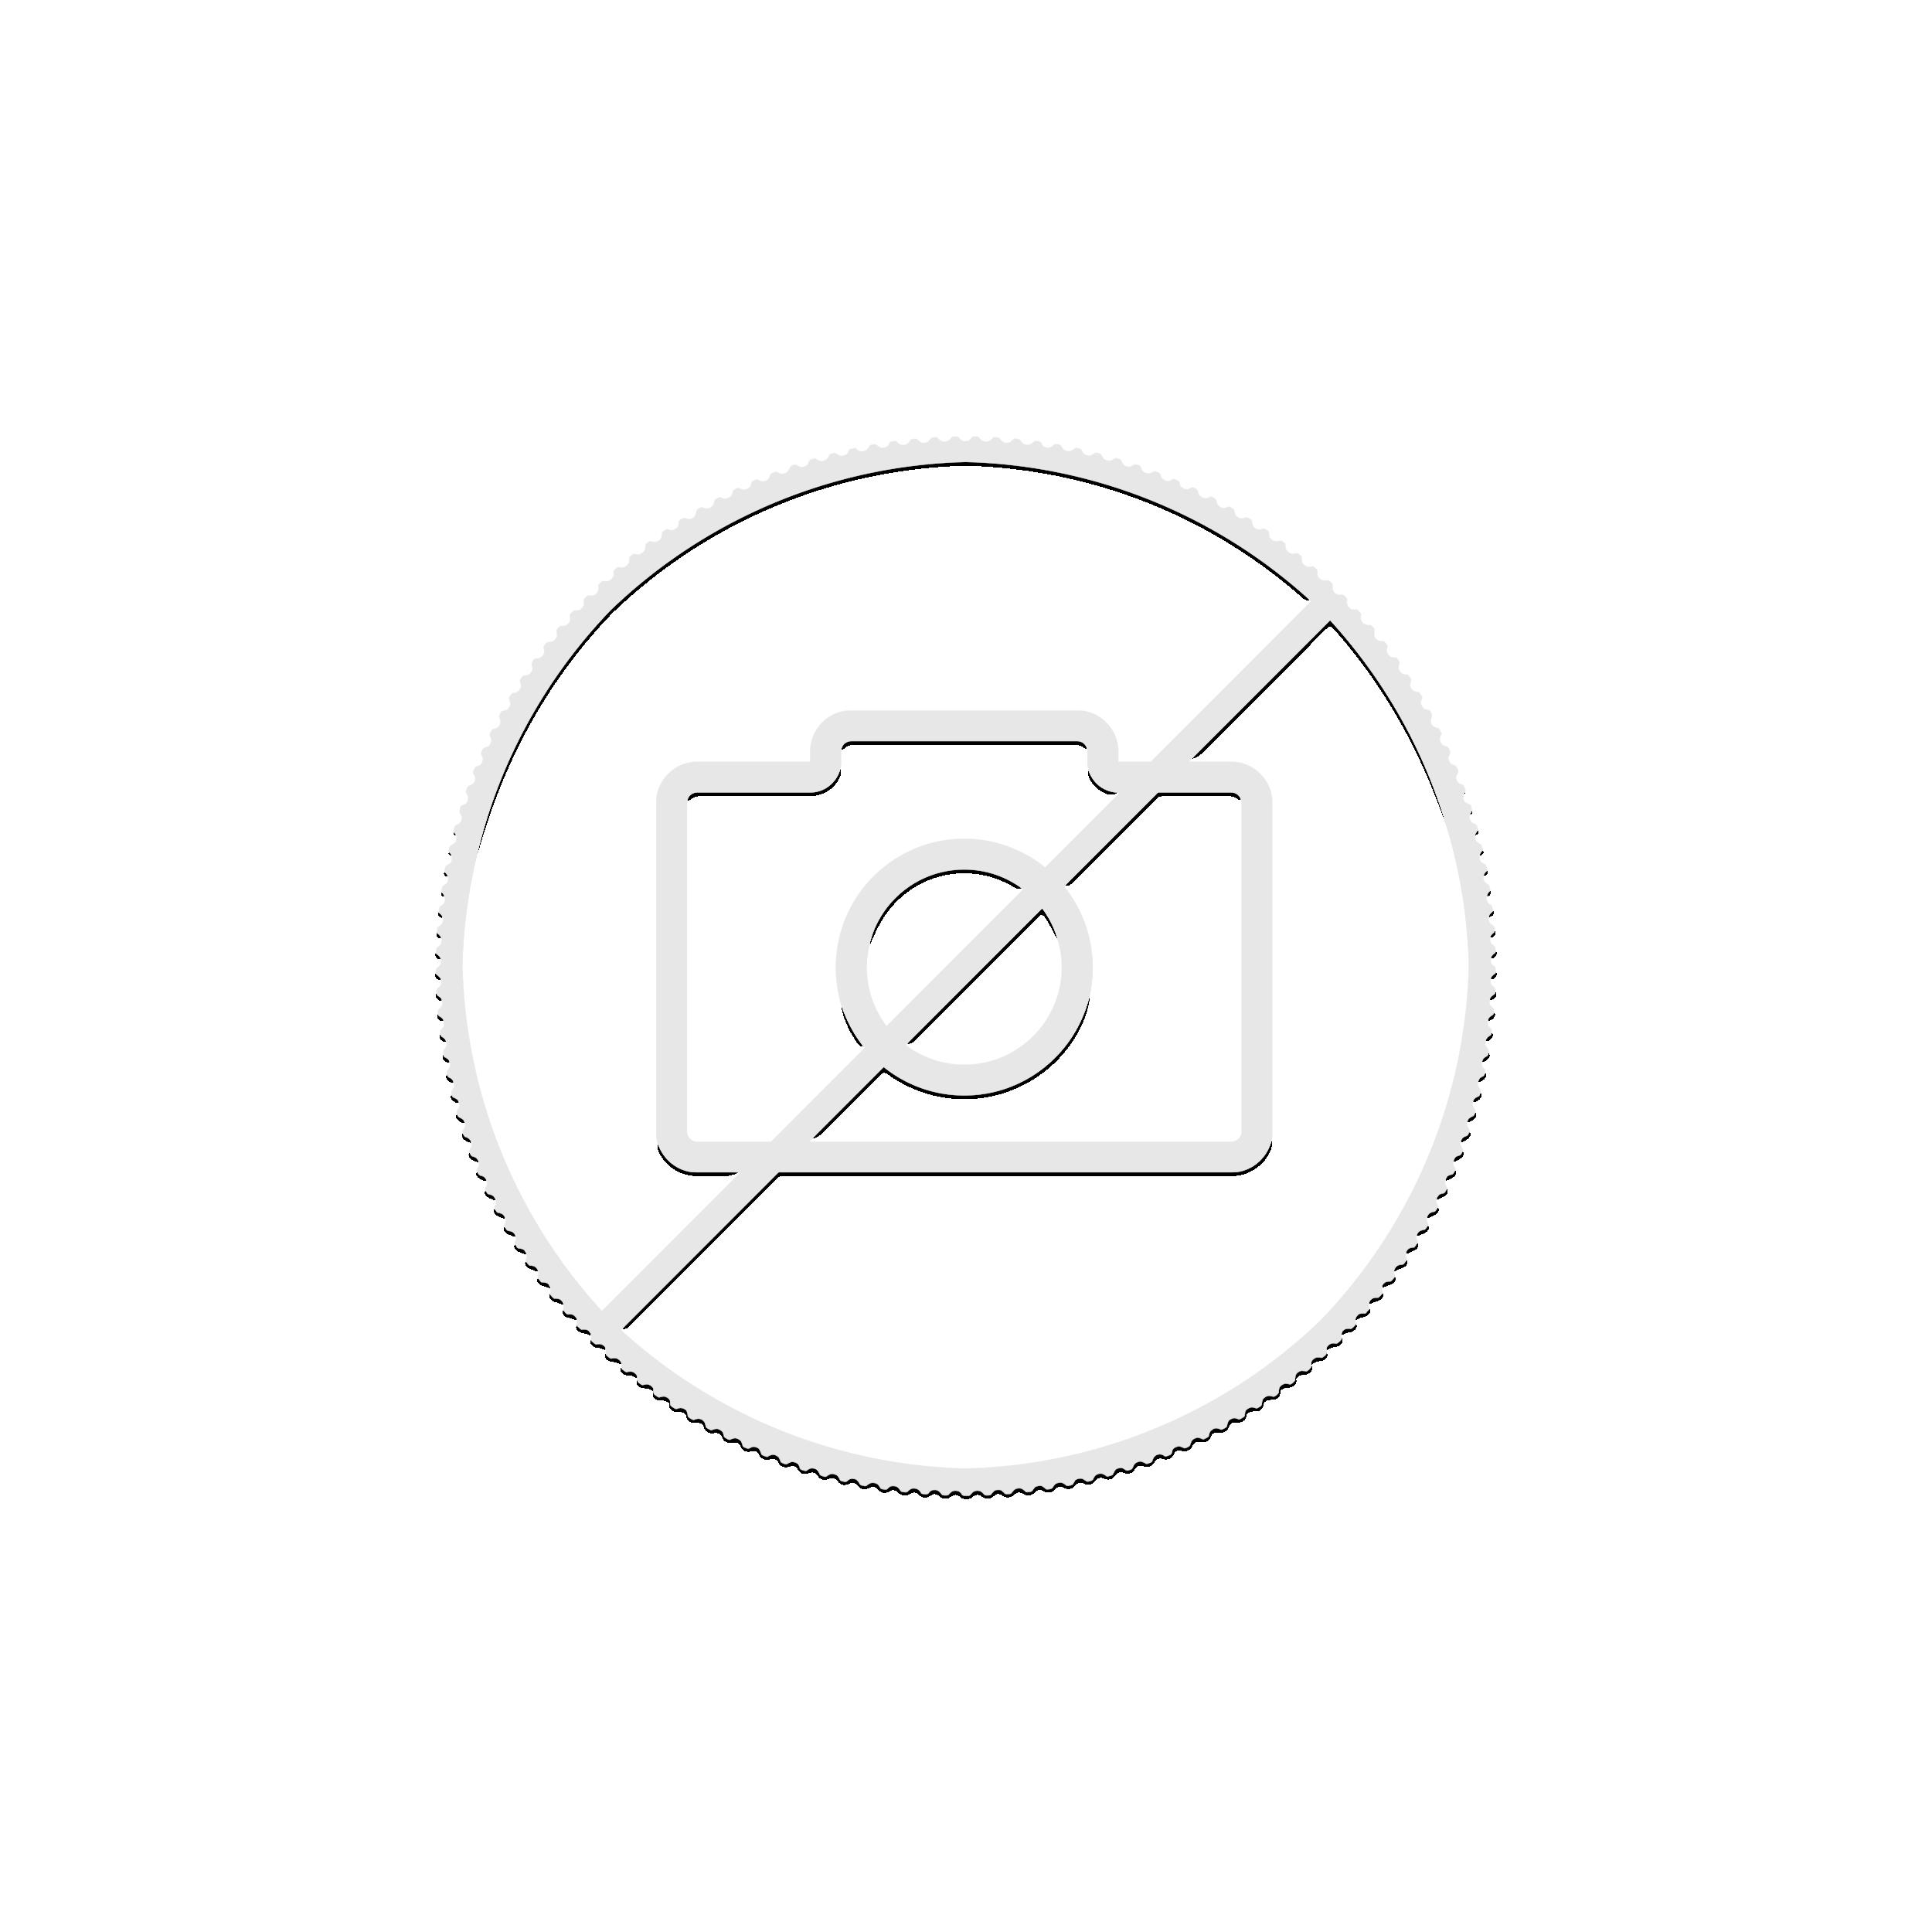 1 Troy ounce gouden Britannia munt 2016 Lunar privy edge